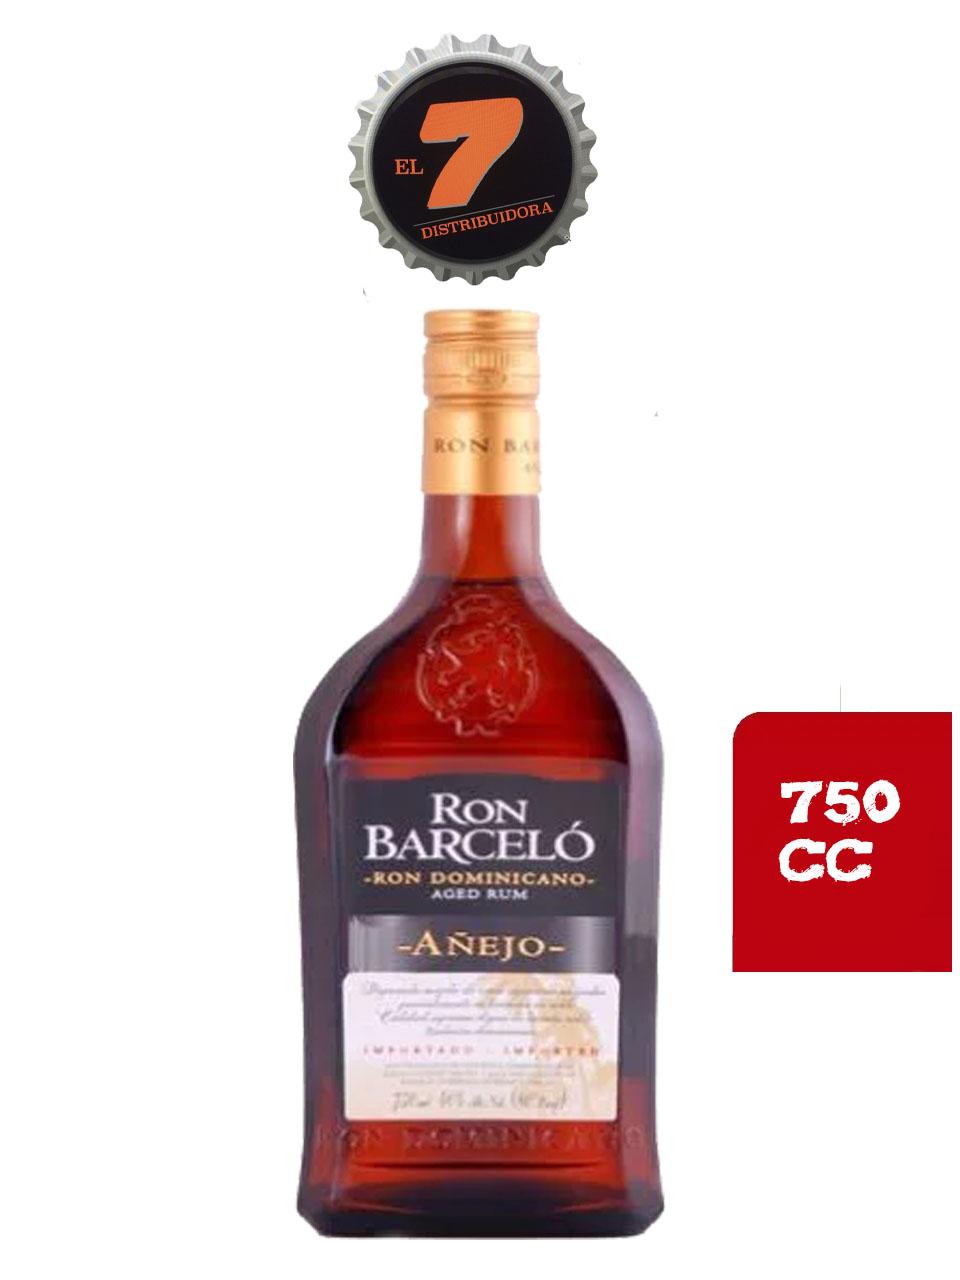 Barcelo Añejo 750 CC